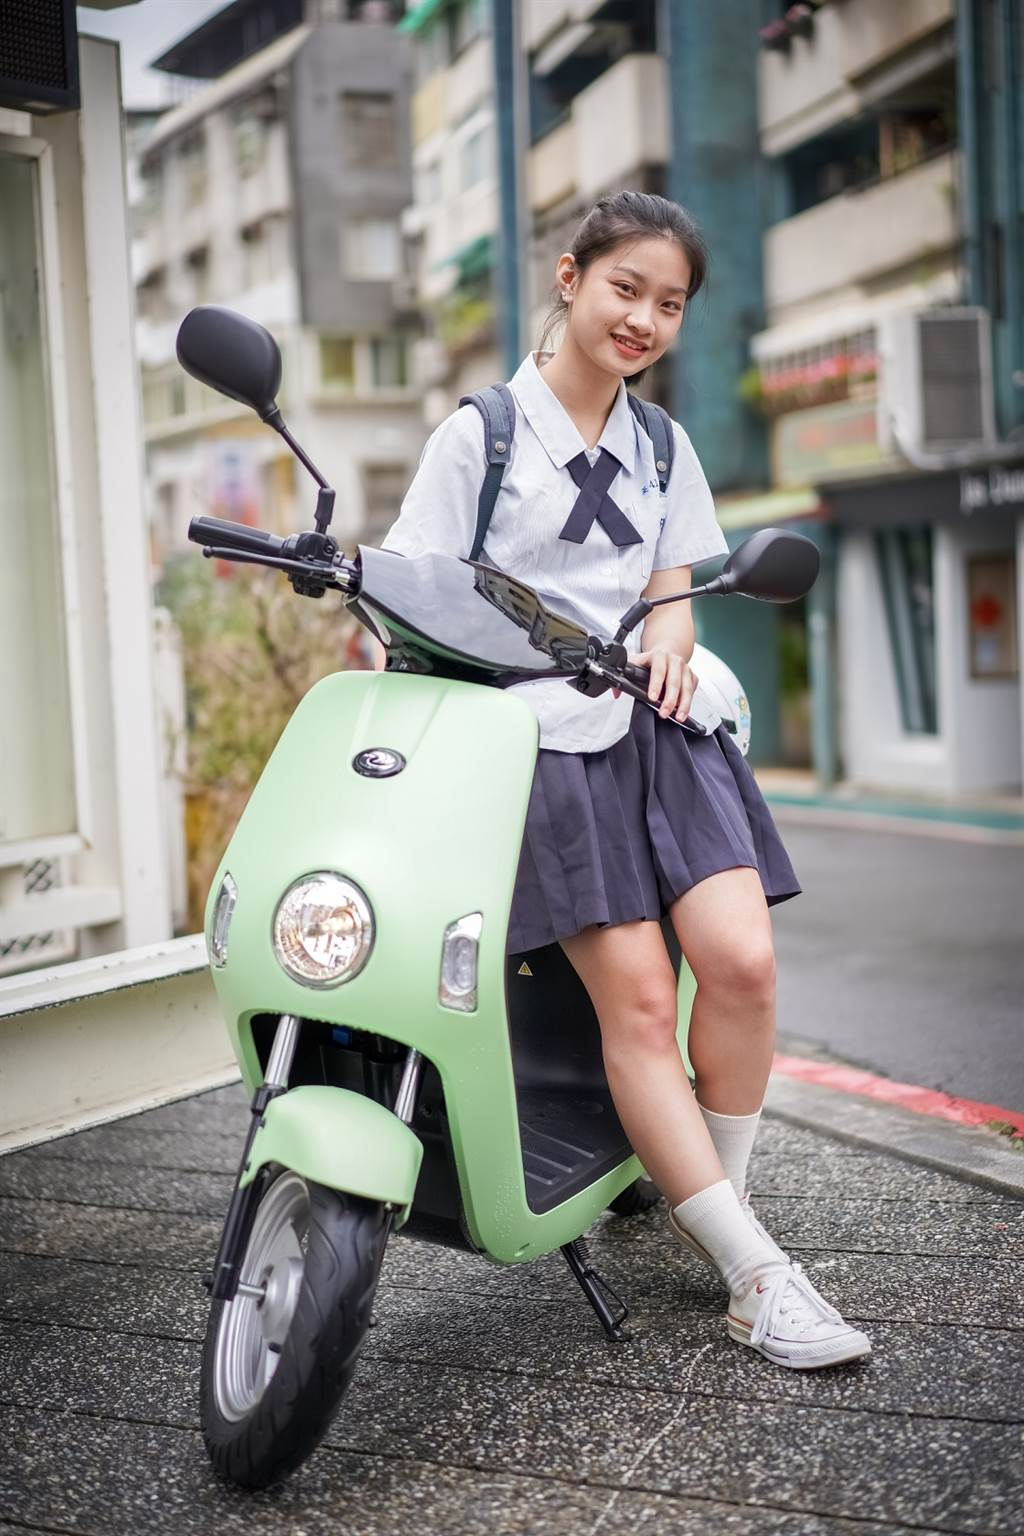 eMoving電動自行車Shine&Bobe免牌免照,是學生代步的熱門選擇。(圖/品牌提供)